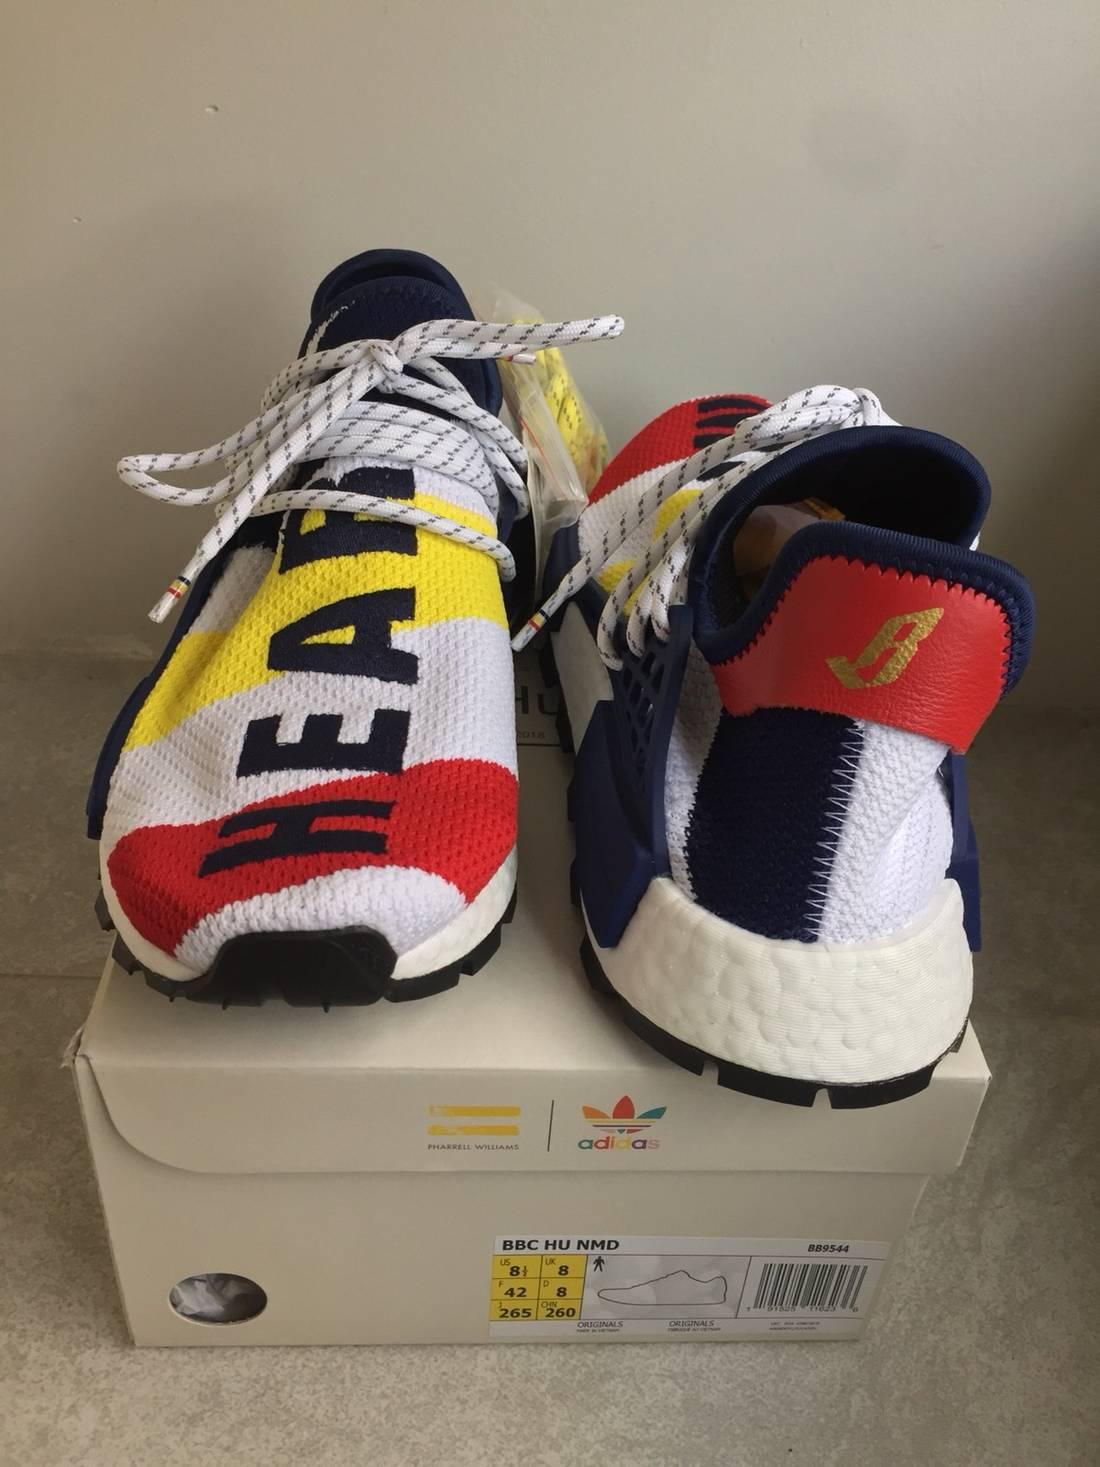 37d719579 Adidas Billionaire Boys Club x Adidas Nmd Hu Pharrell 8.5 BBC Human Race  BB9544 Size US .